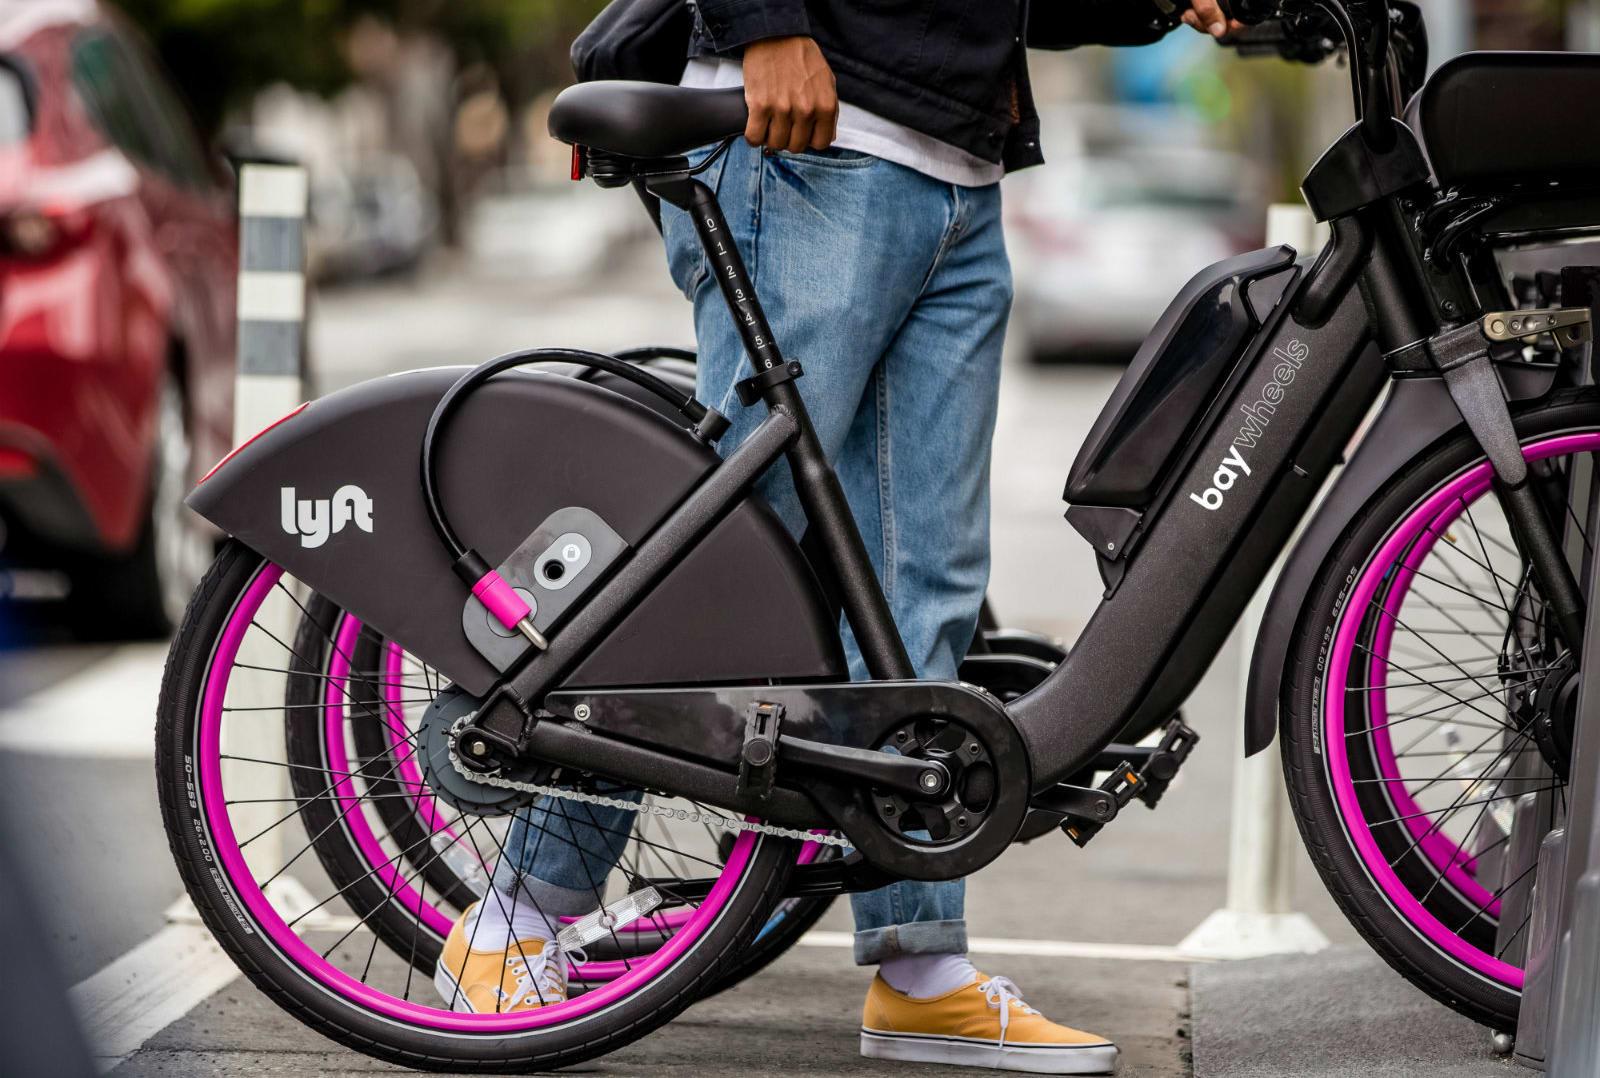 Lyft disables San Francisco e-bikes after suspected battery